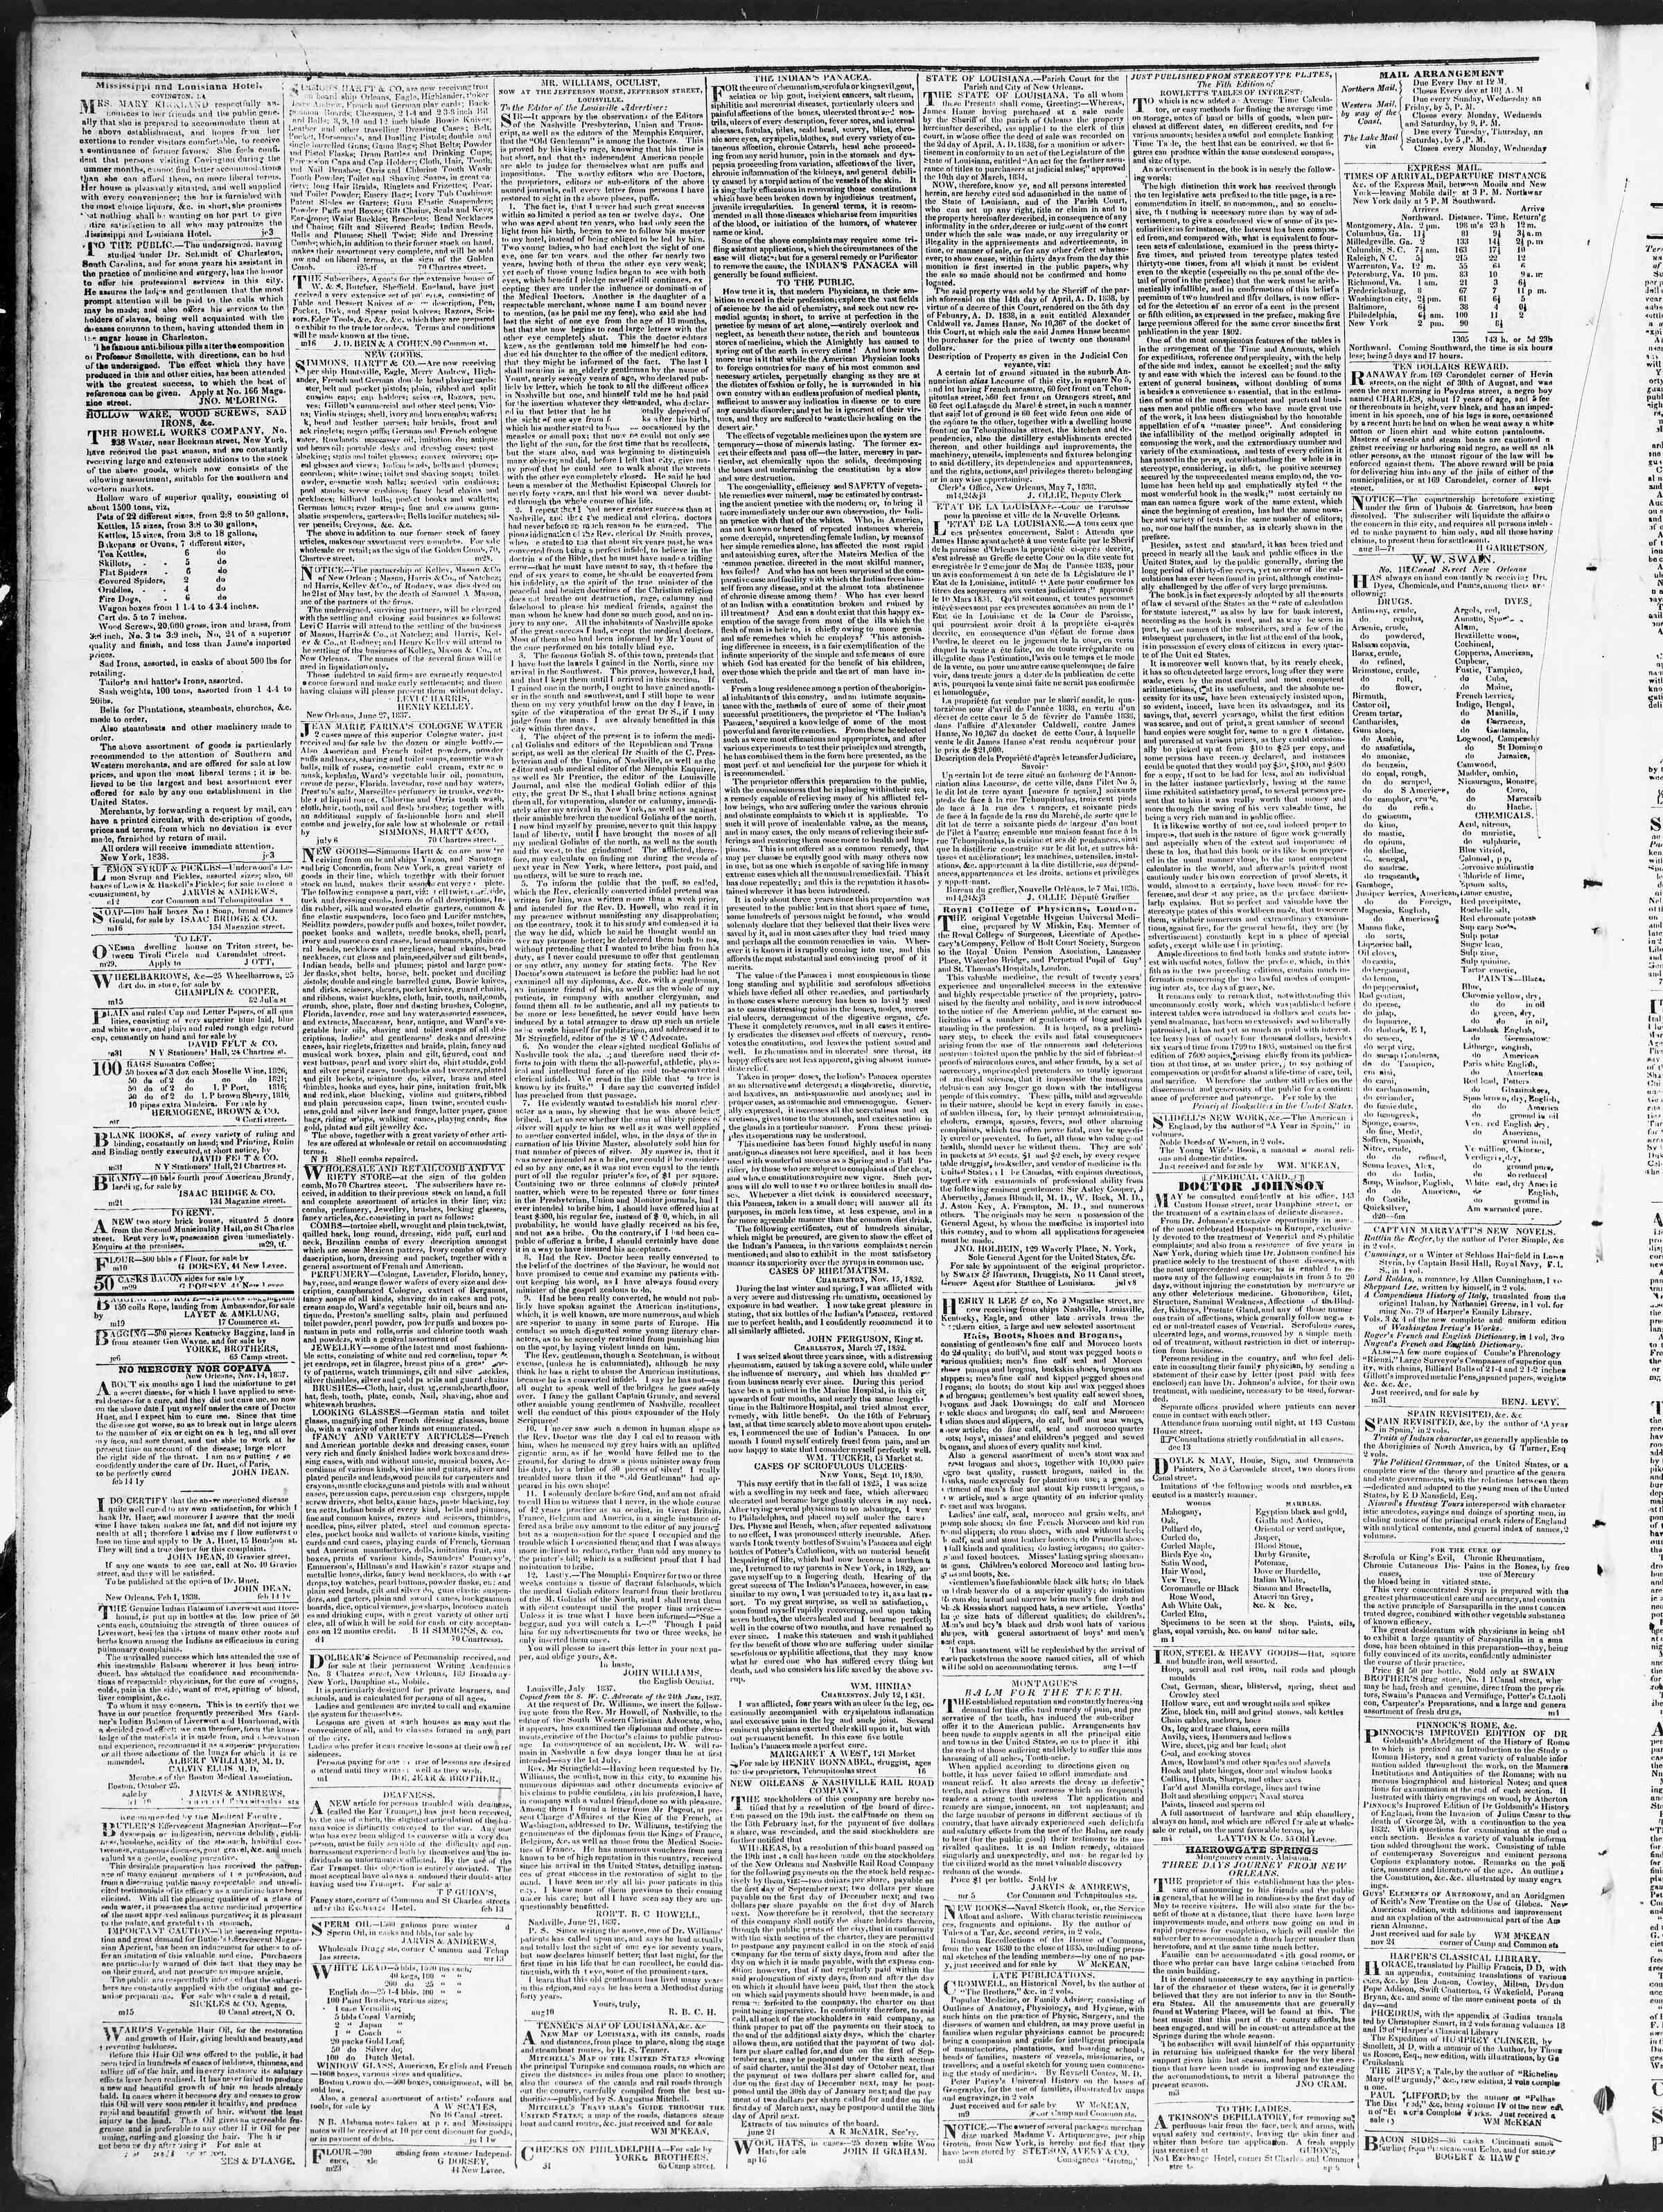 August 23, 1838 Tarihli True American Gazetesi Sayfa 4